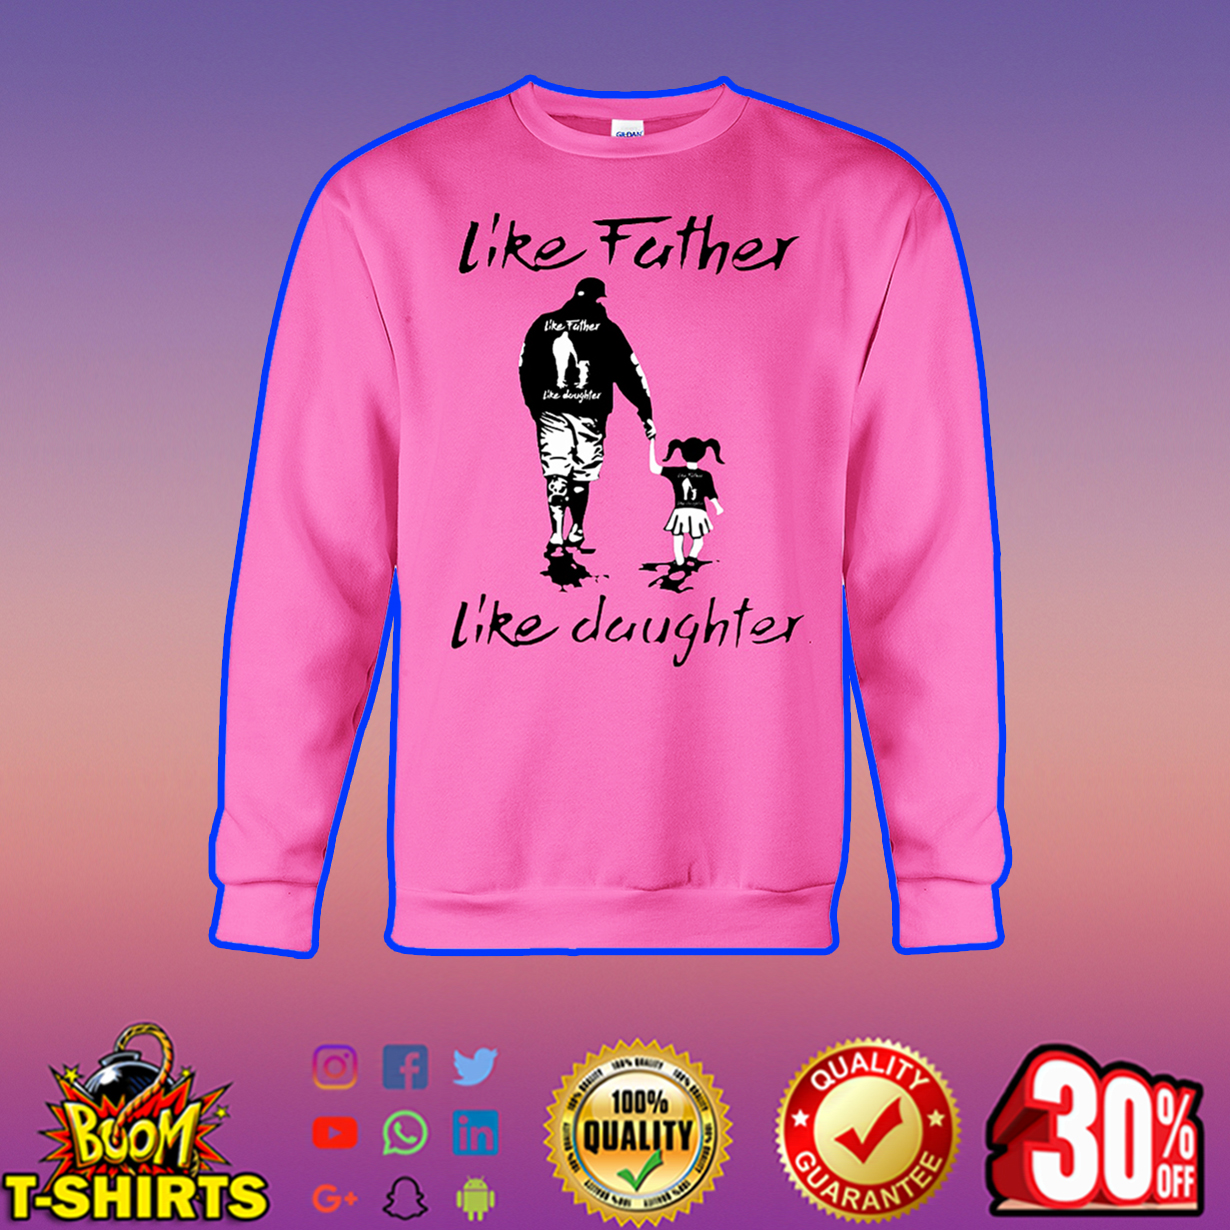 Like father like daughter sweatshirt